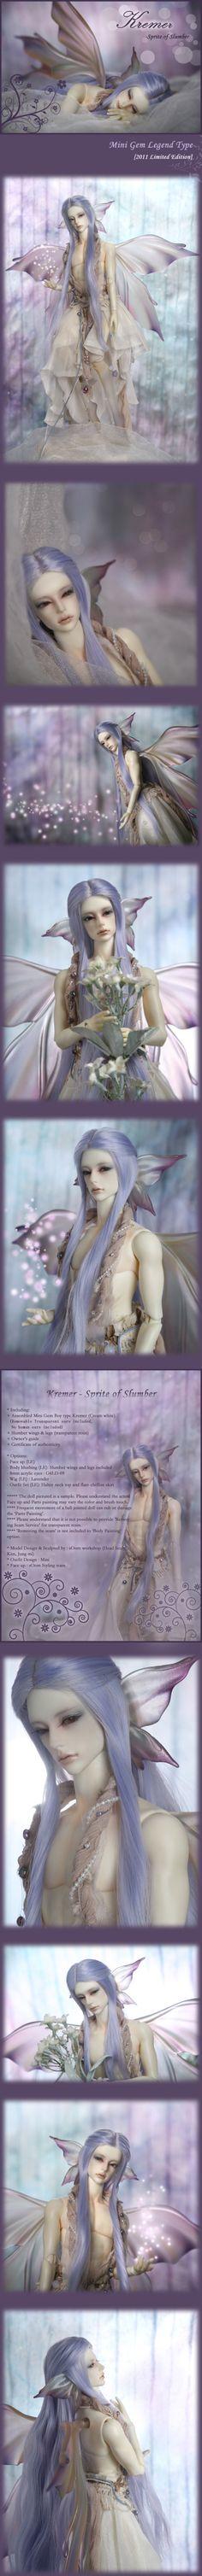 SOOM Kremer fantasy version [Kremer] - $189.00 : BJD baby,bjd dolls,bjd doll shop,bjd bragan?a,fairyland,volks bjd,soom,luts bjd,Super Dollfie, BJD lovers collect community